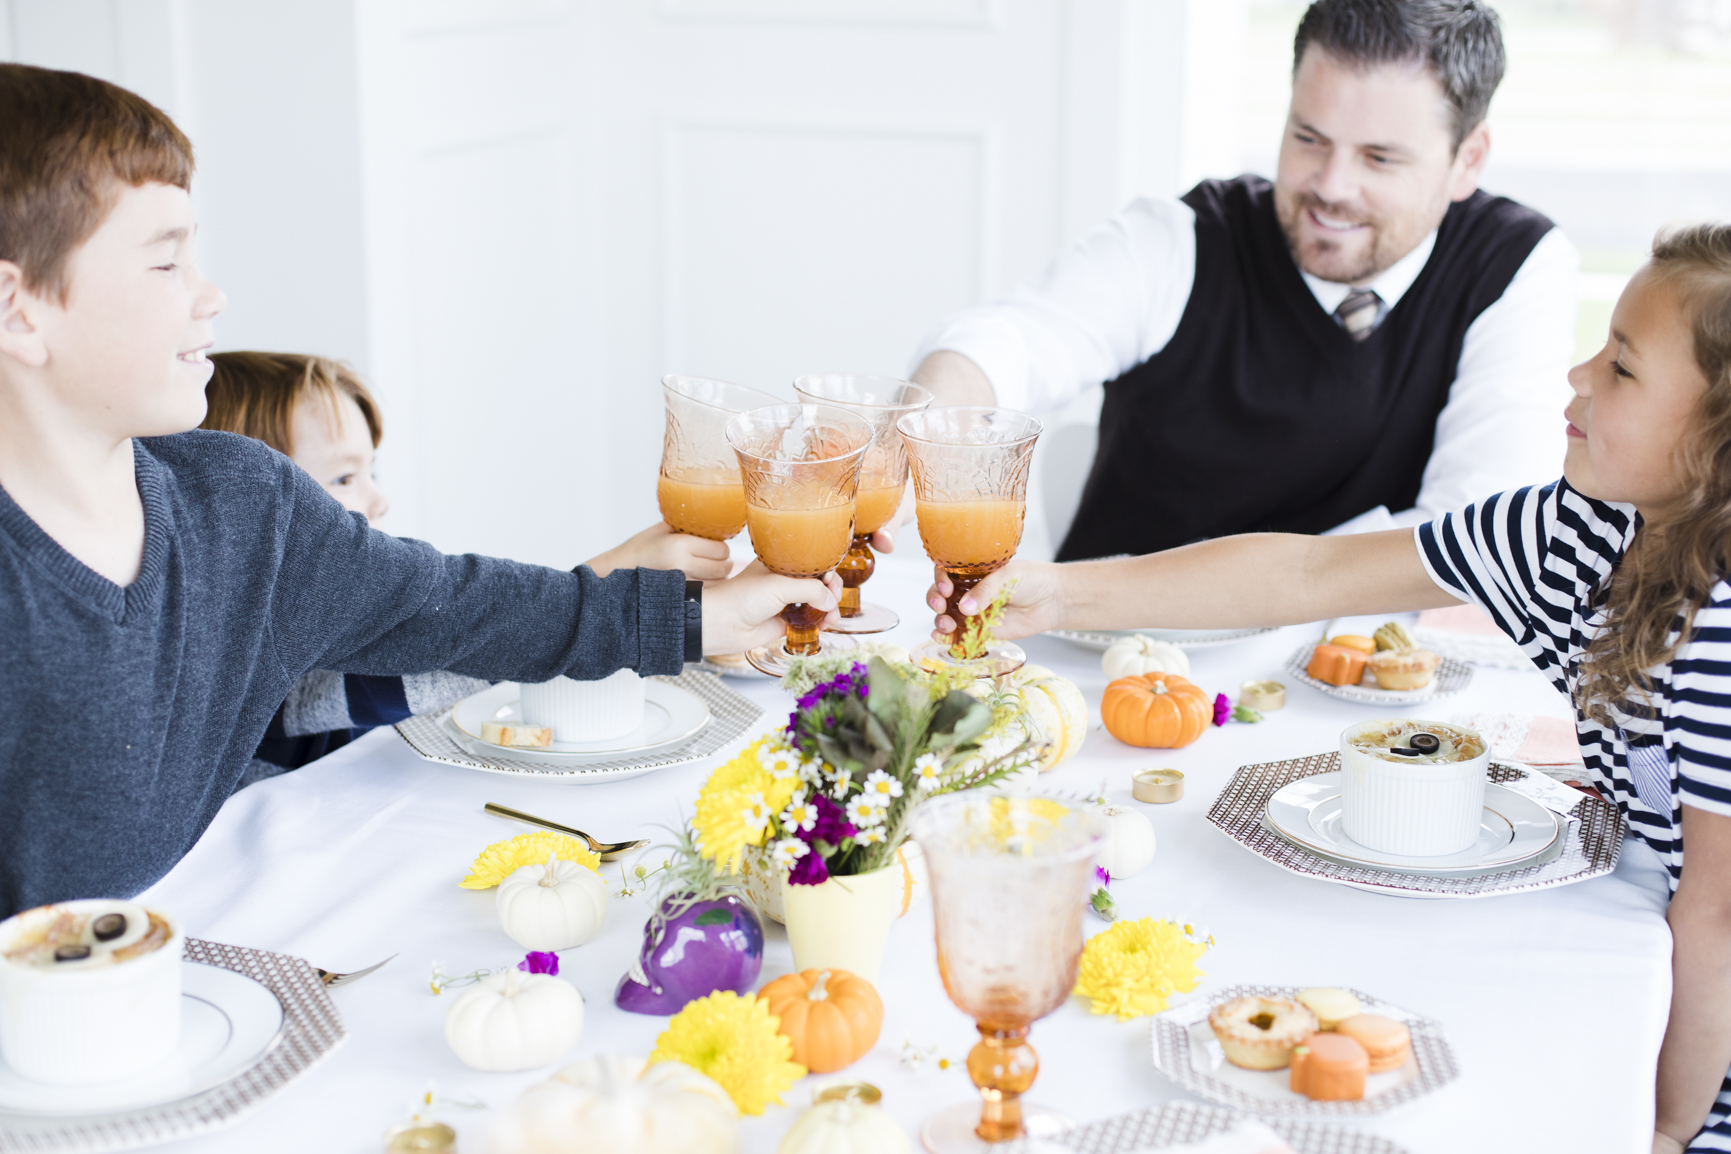 Family Cheers